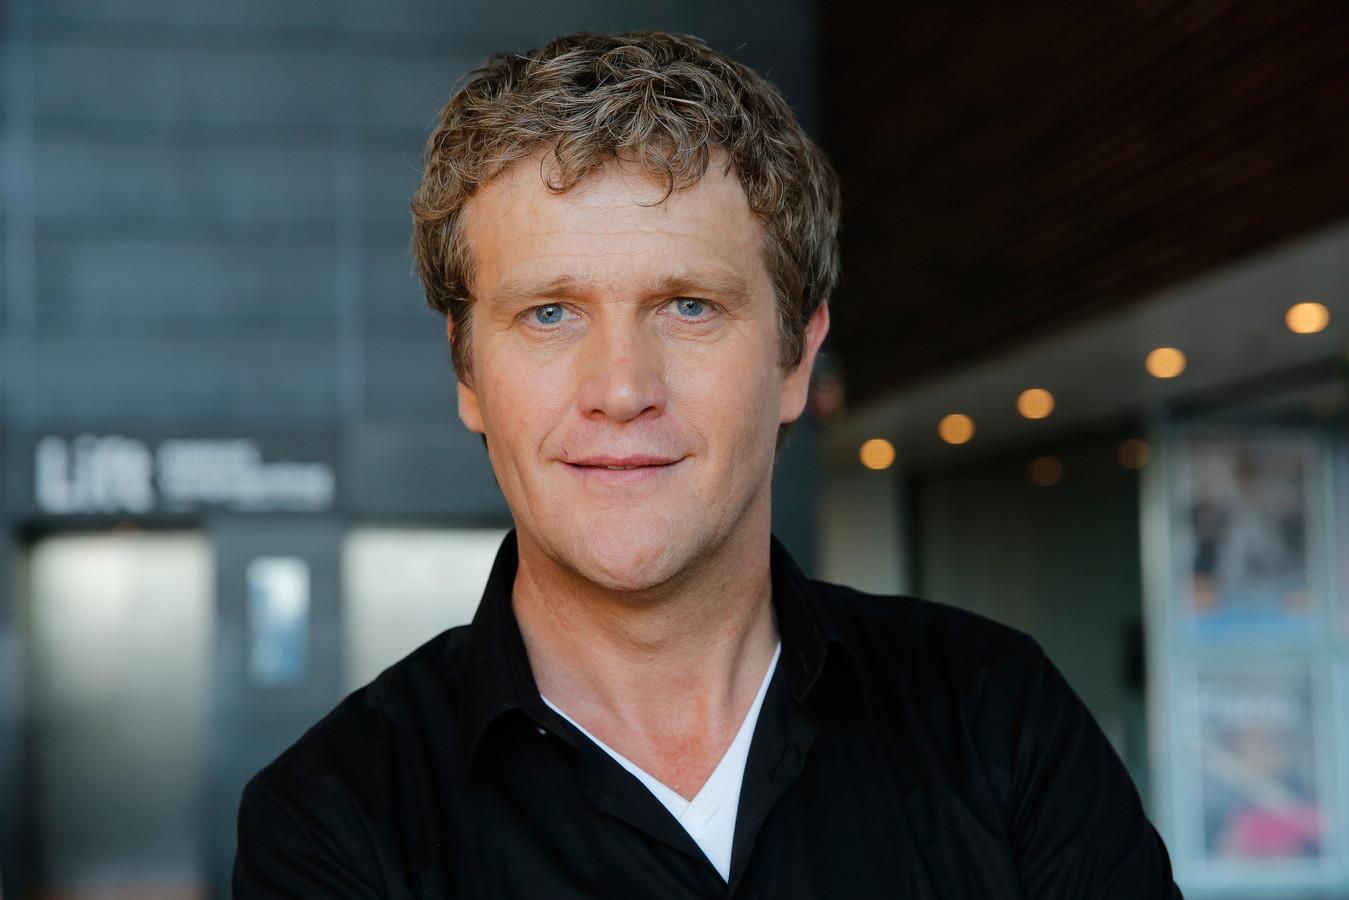 Alberto Stegeman, presentator van het televisieprogramma 'Undercover in Nederland'.